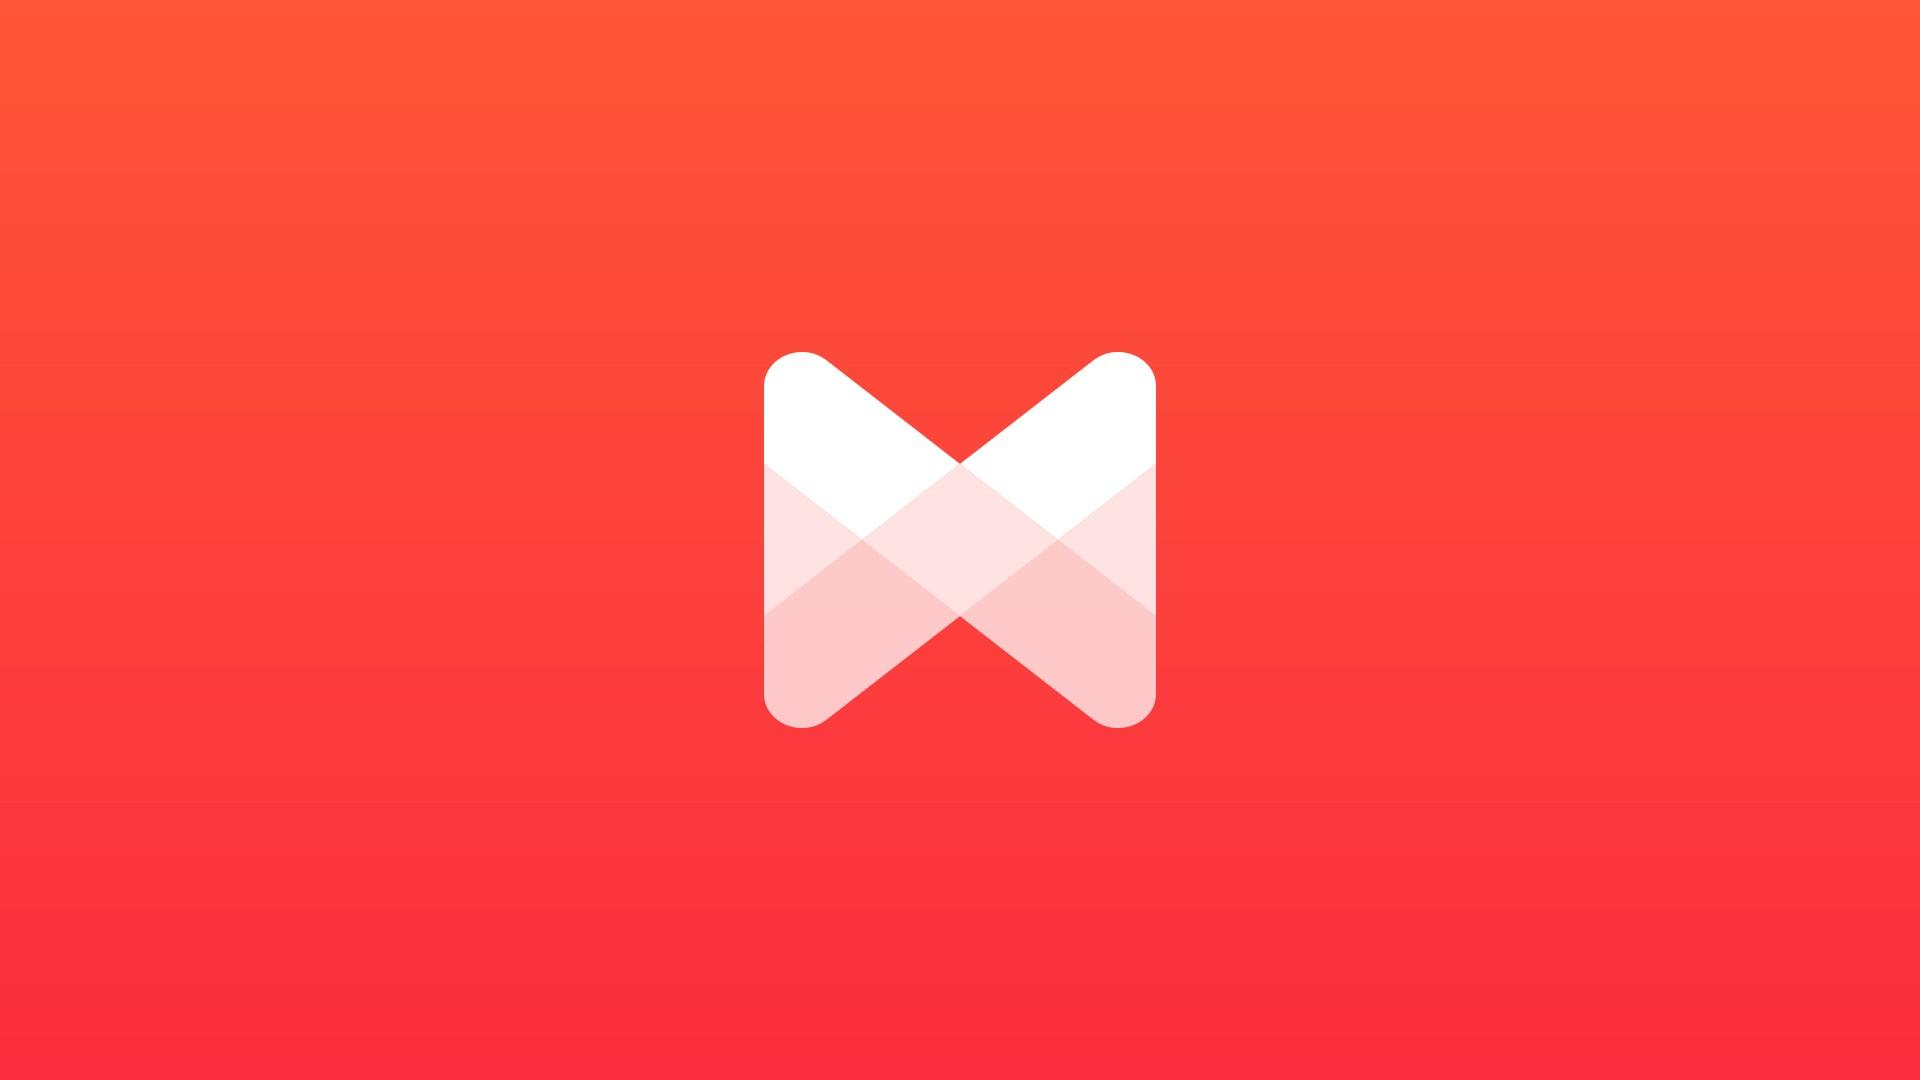 Learn Italian Through Songs with Musixmatch — Europass